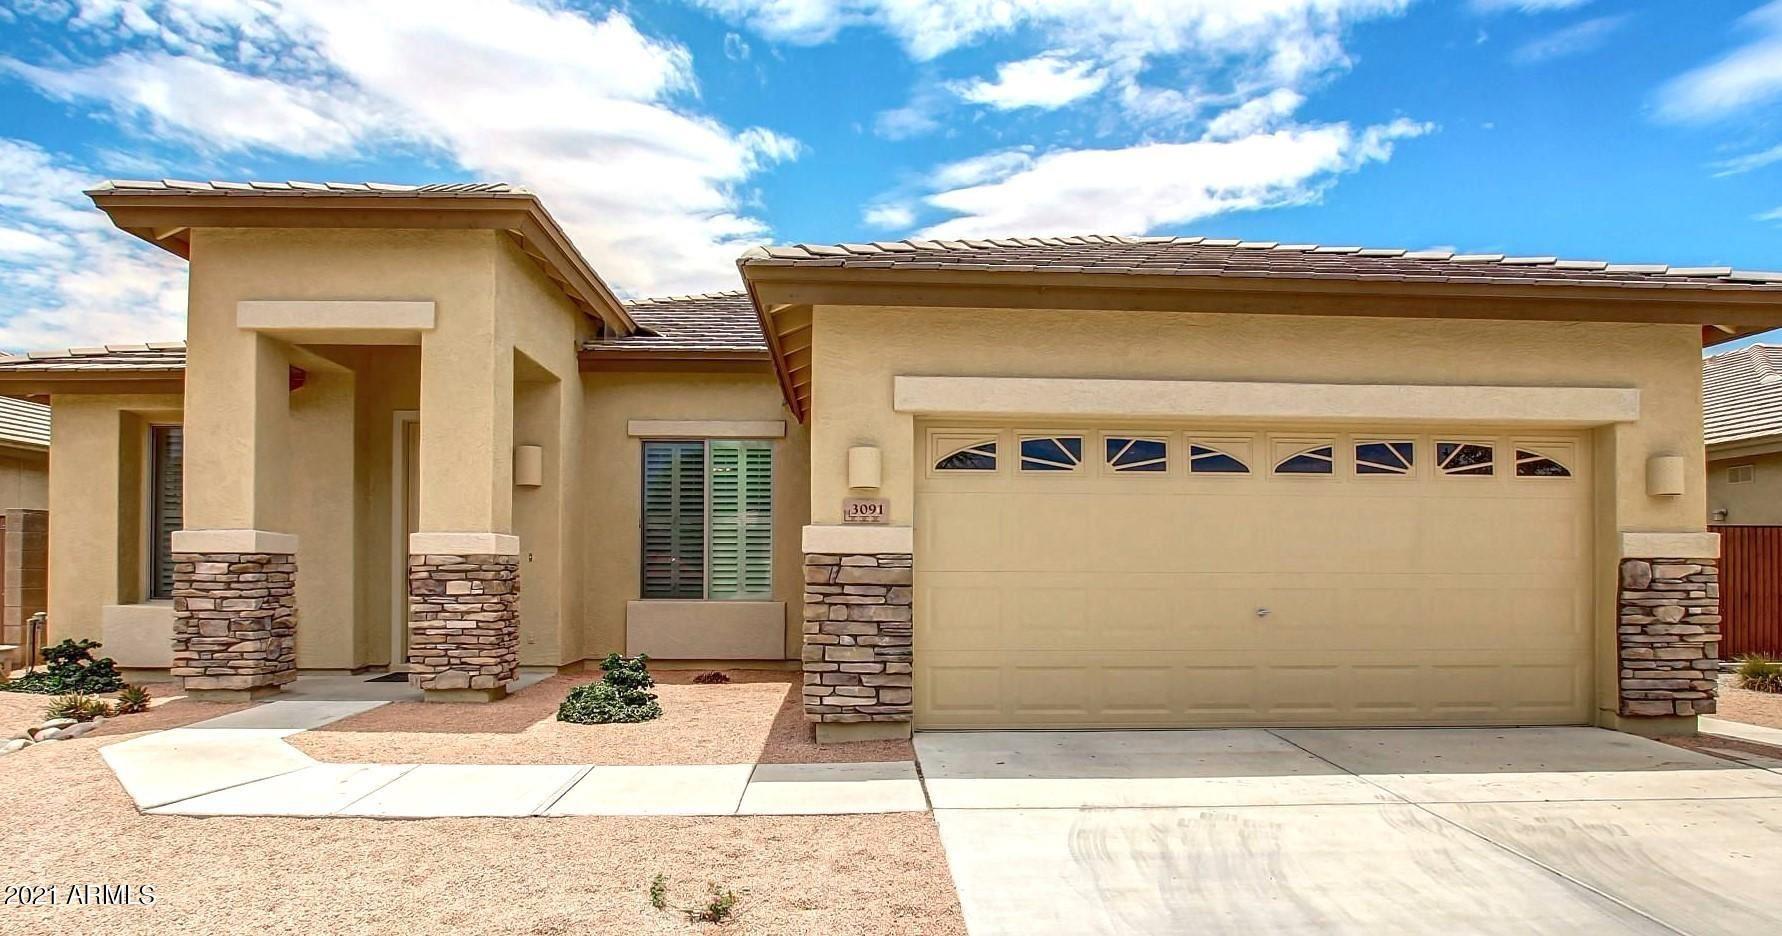 Photo of 3091 E LARK Drive, Chandler, AZ 85286 (MLS # 6234401)